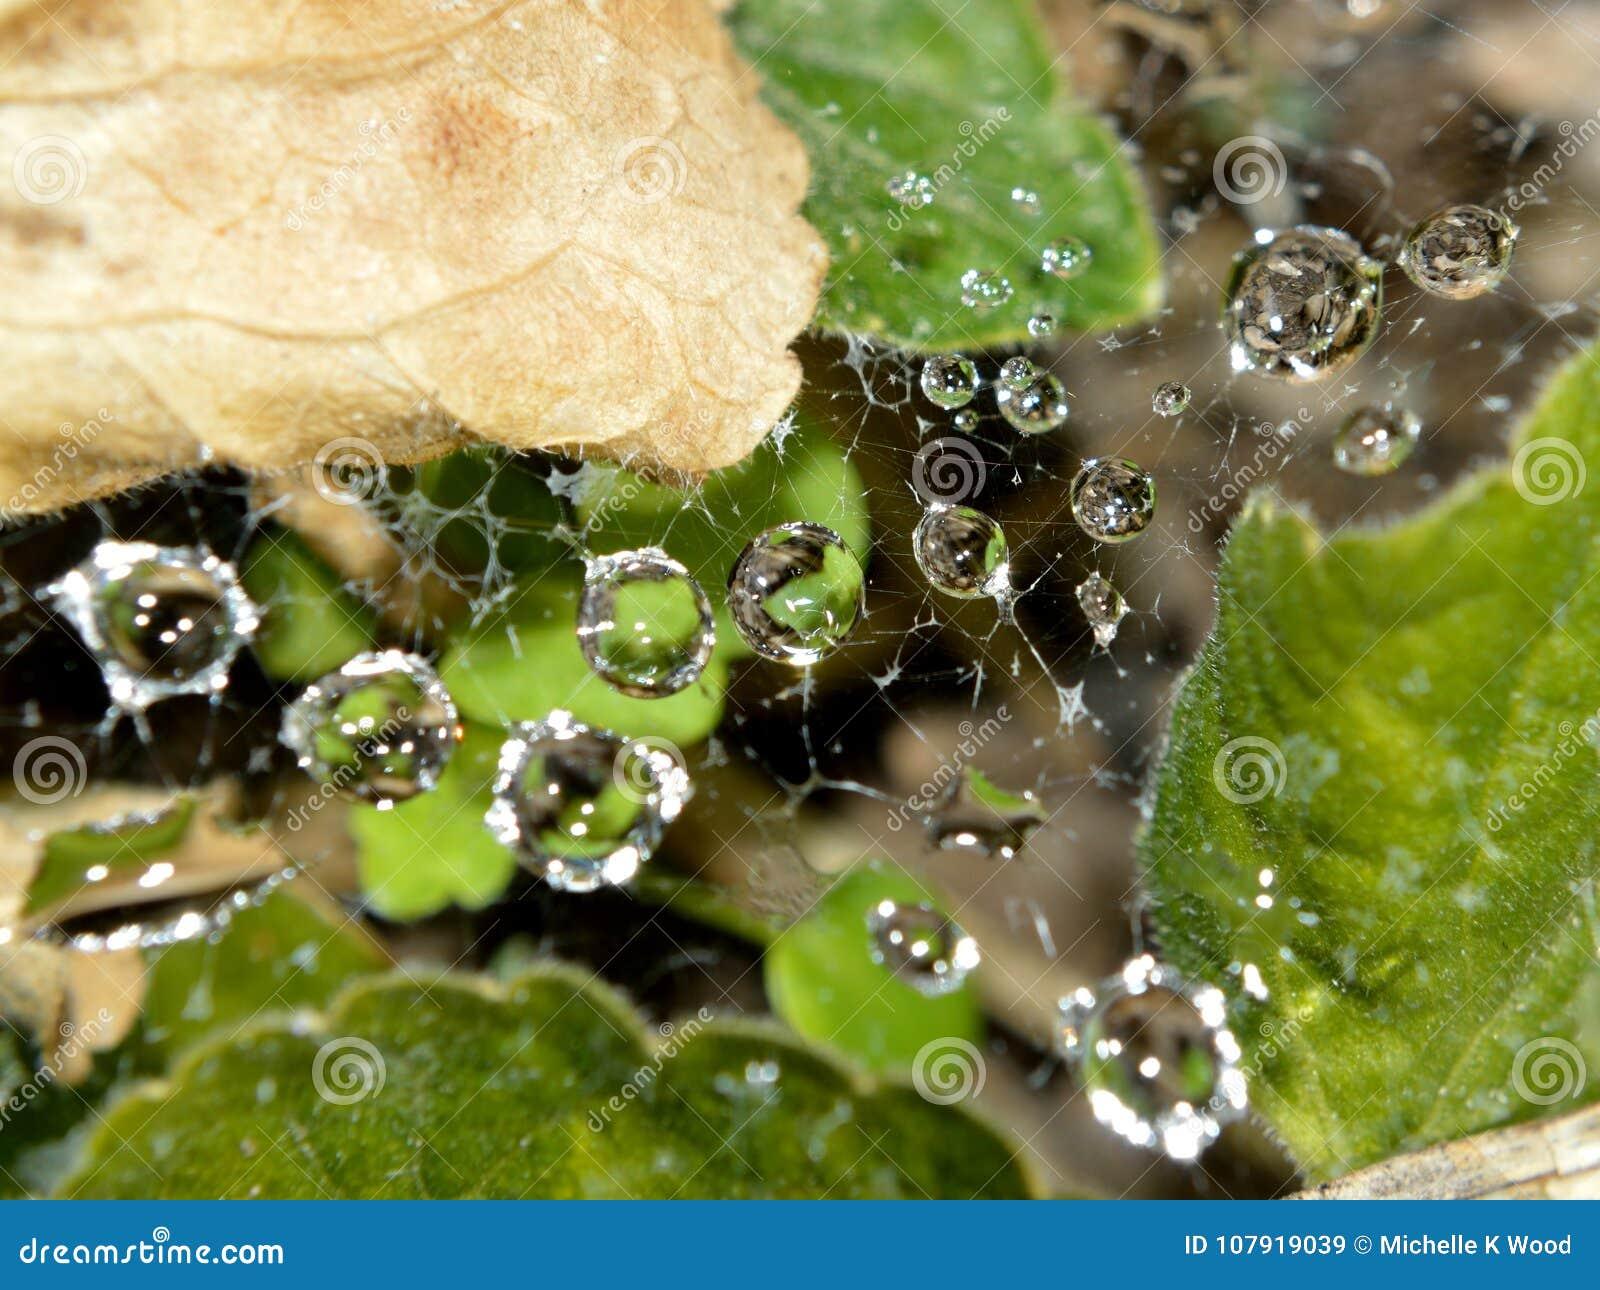 Macro closeup of raindrops in web